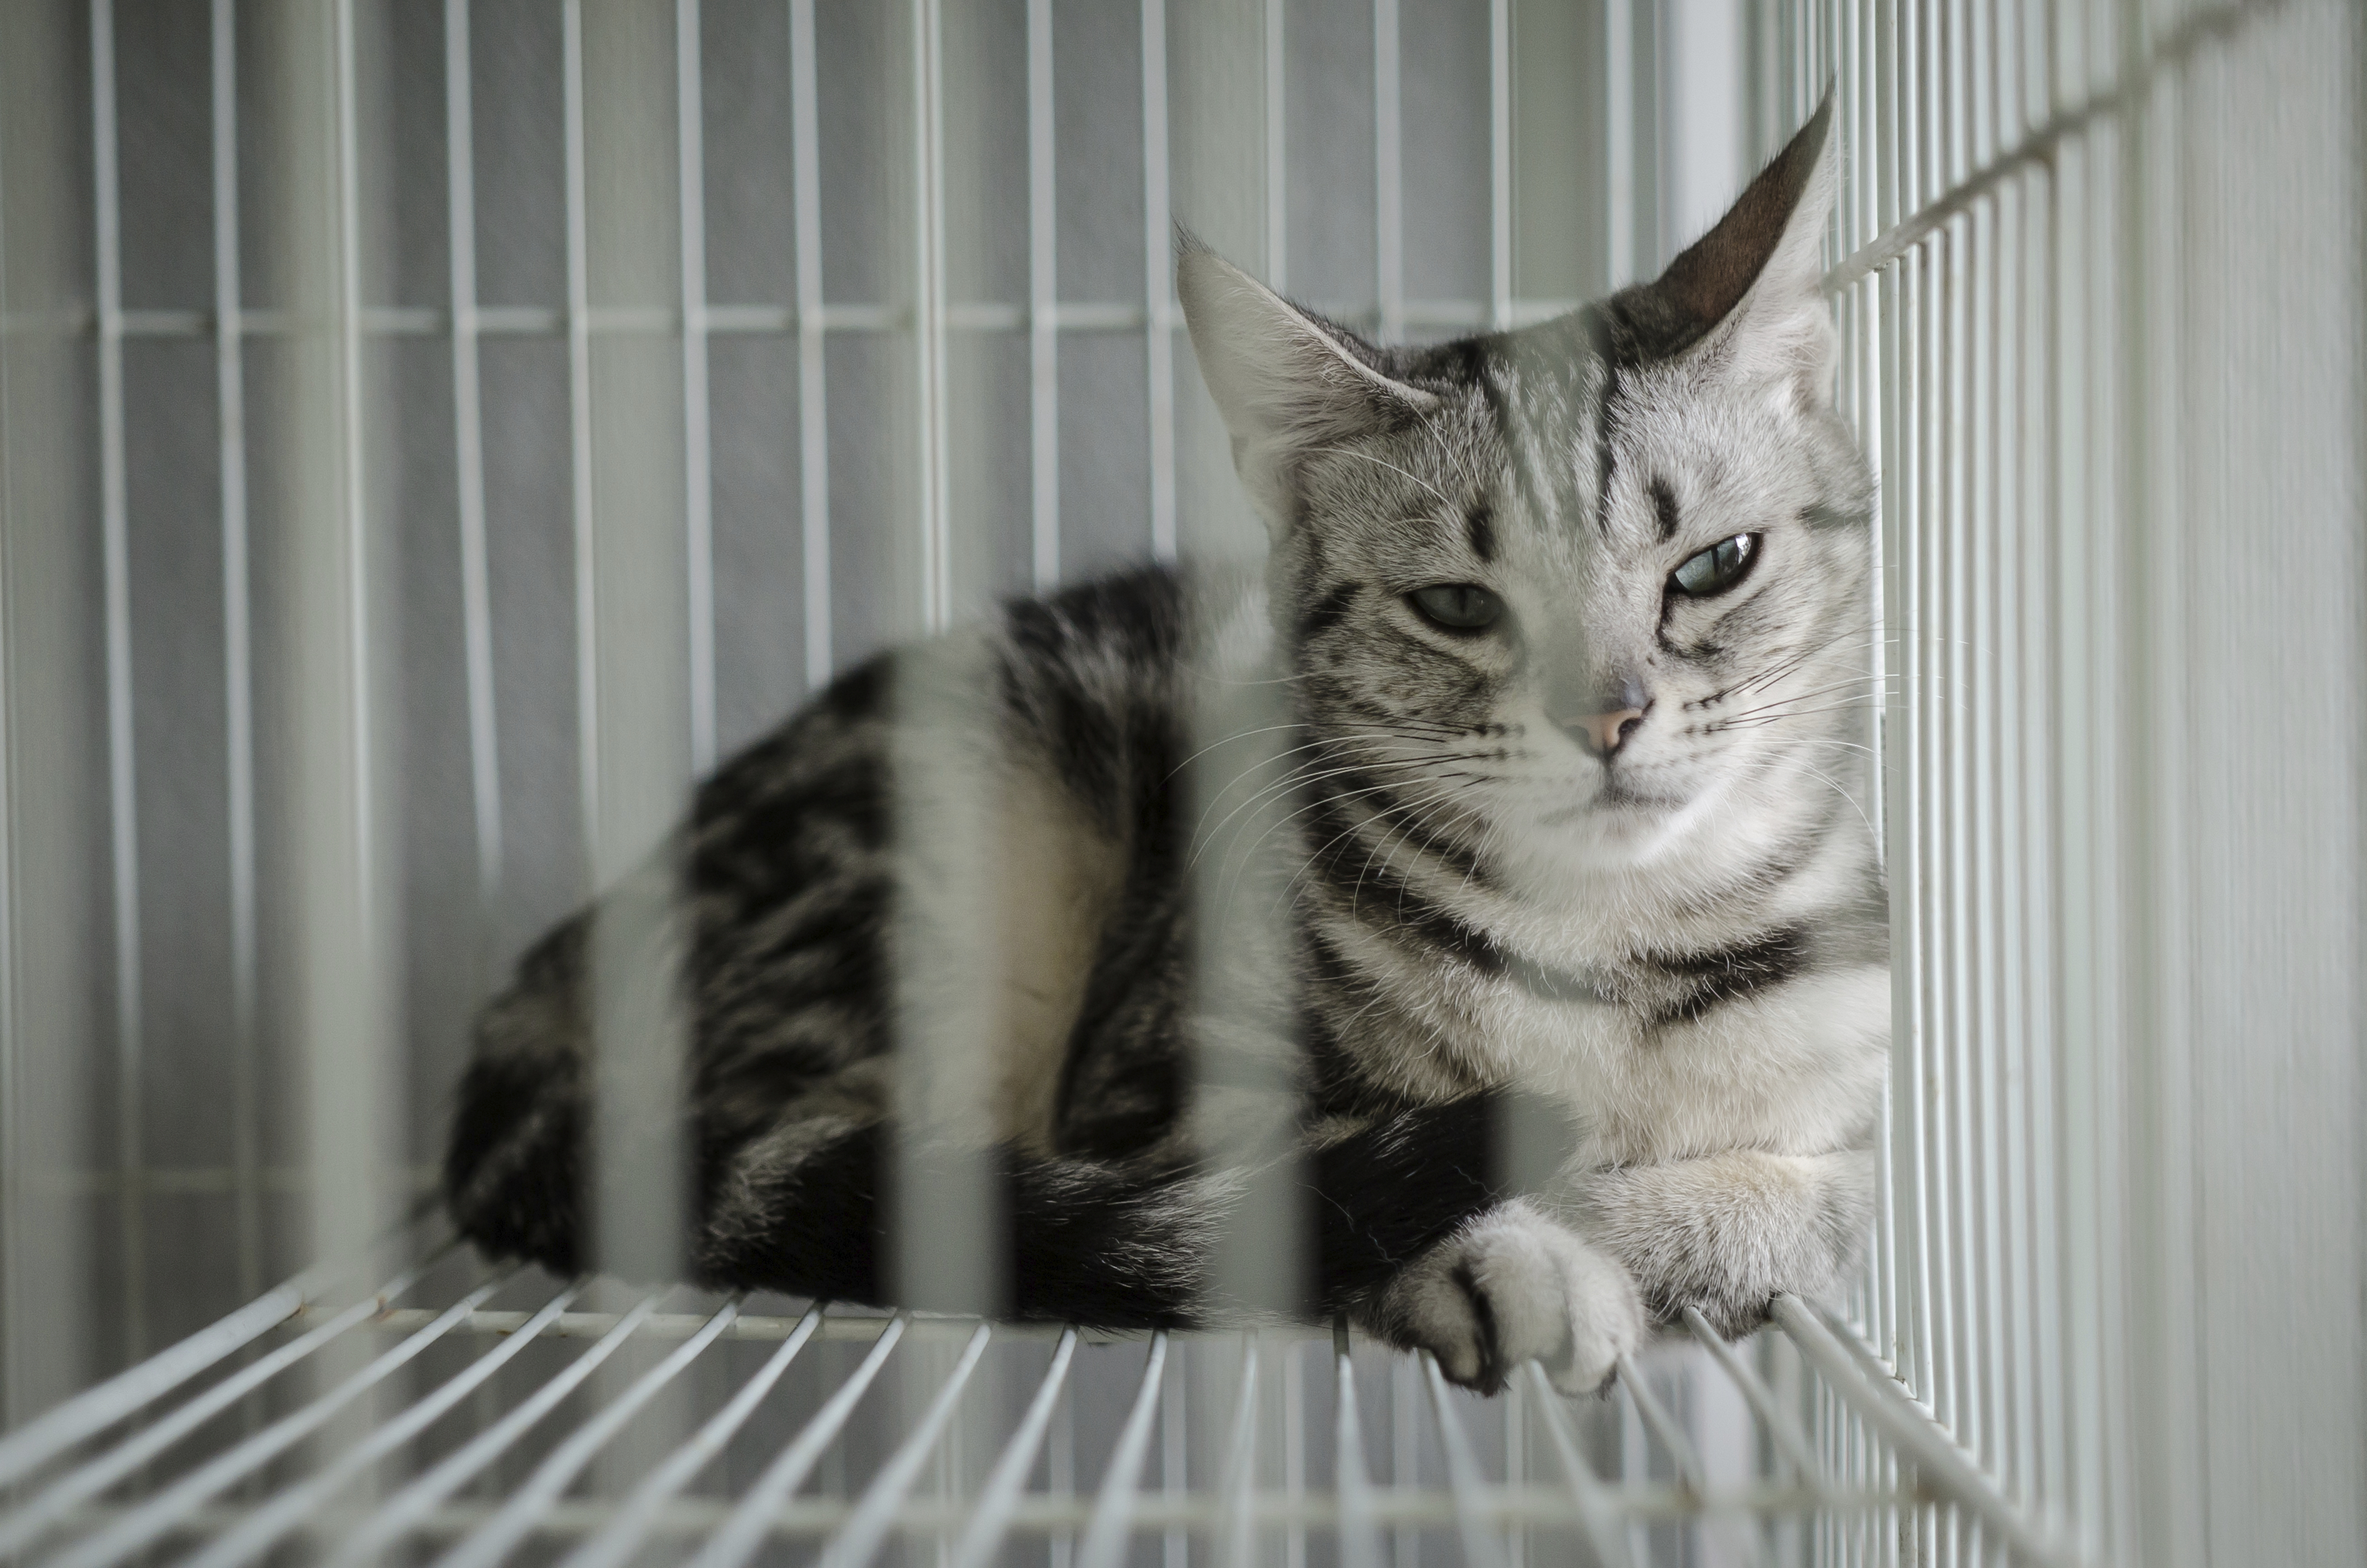 cat_sad_in_cage_grey.jpg